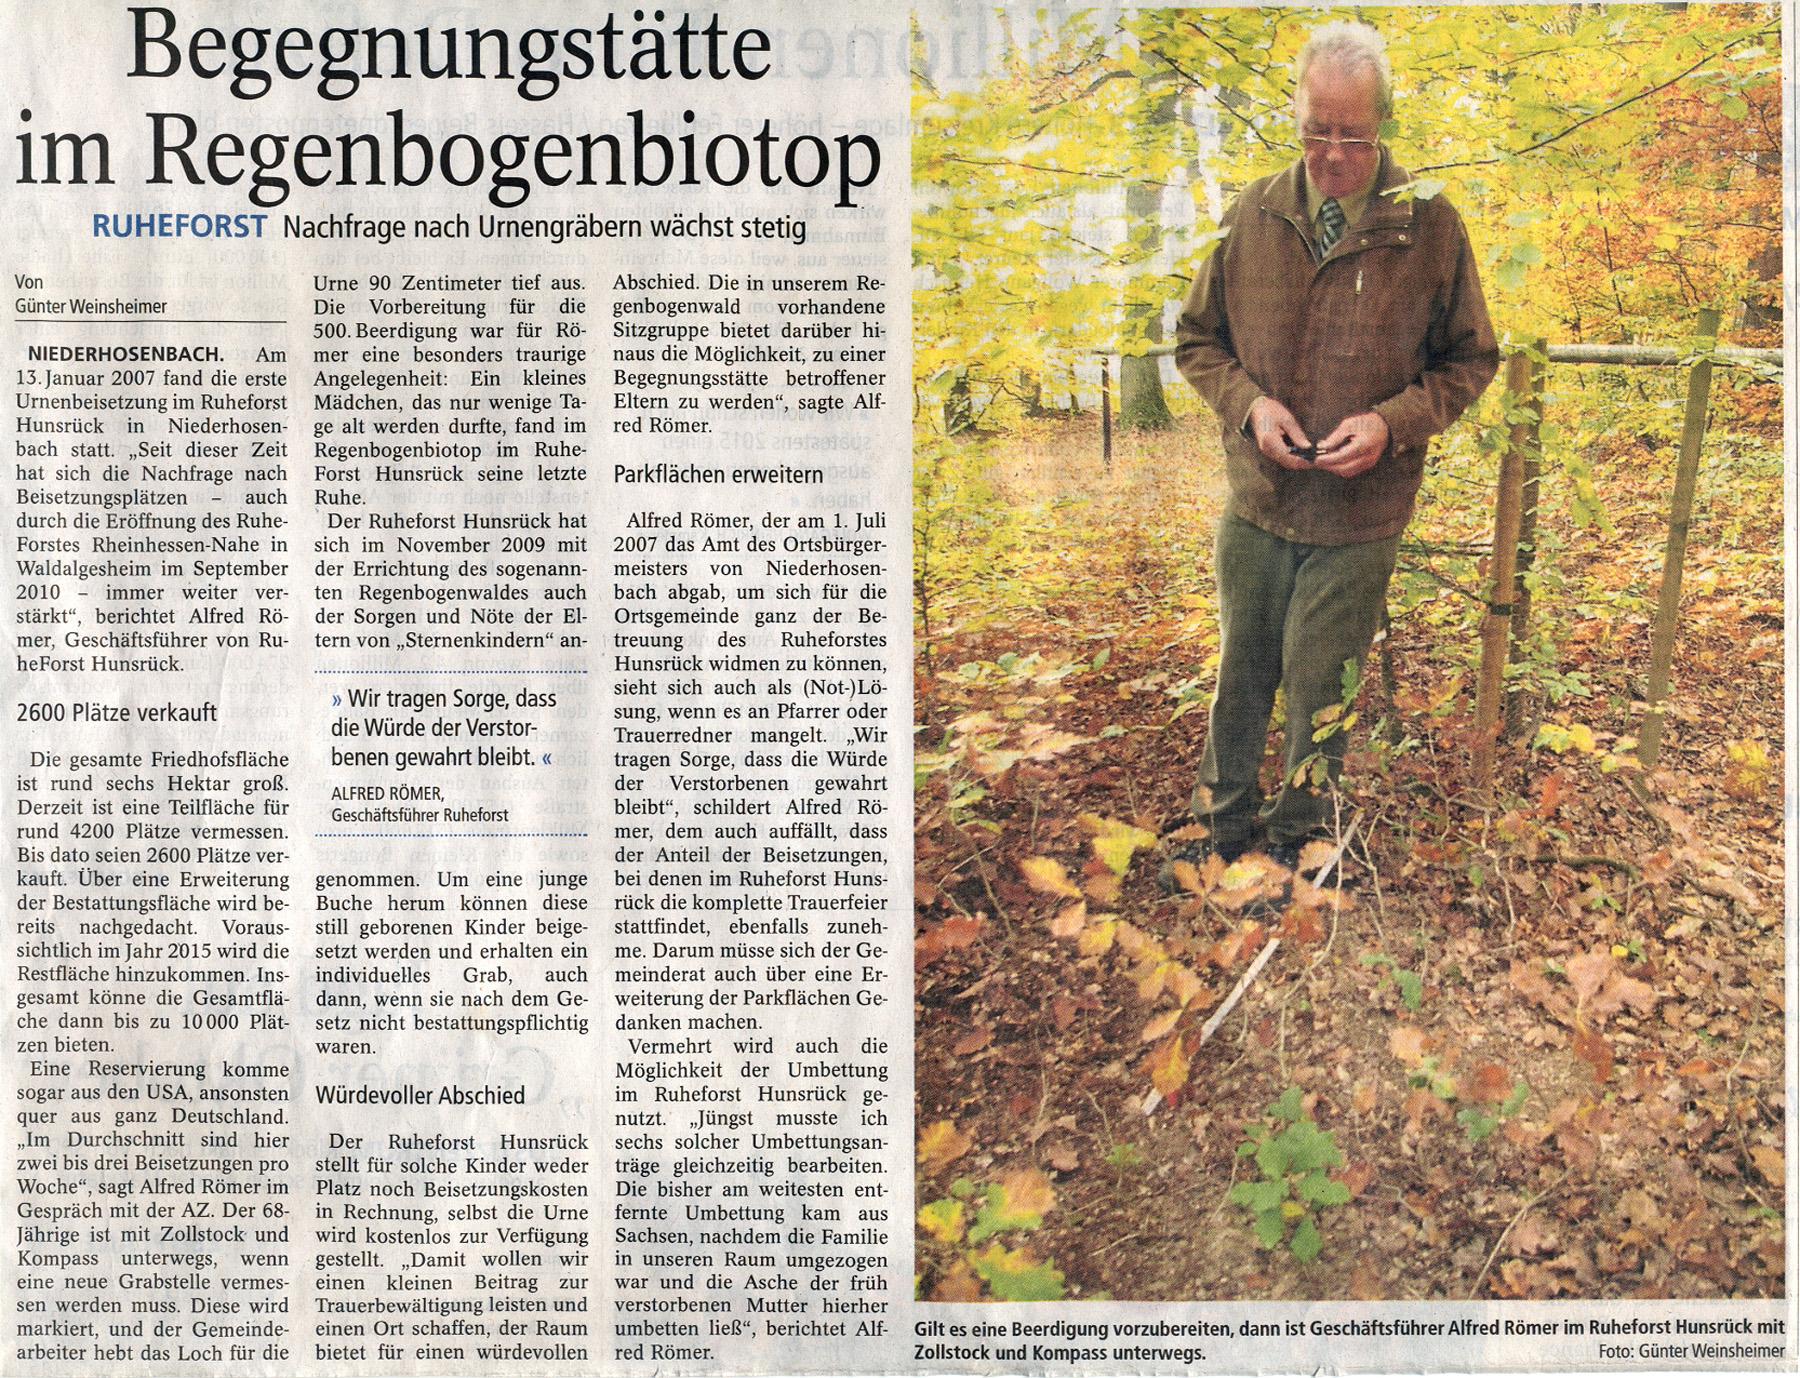 2012.11.08. Rhein-Main-Presse - Kopie